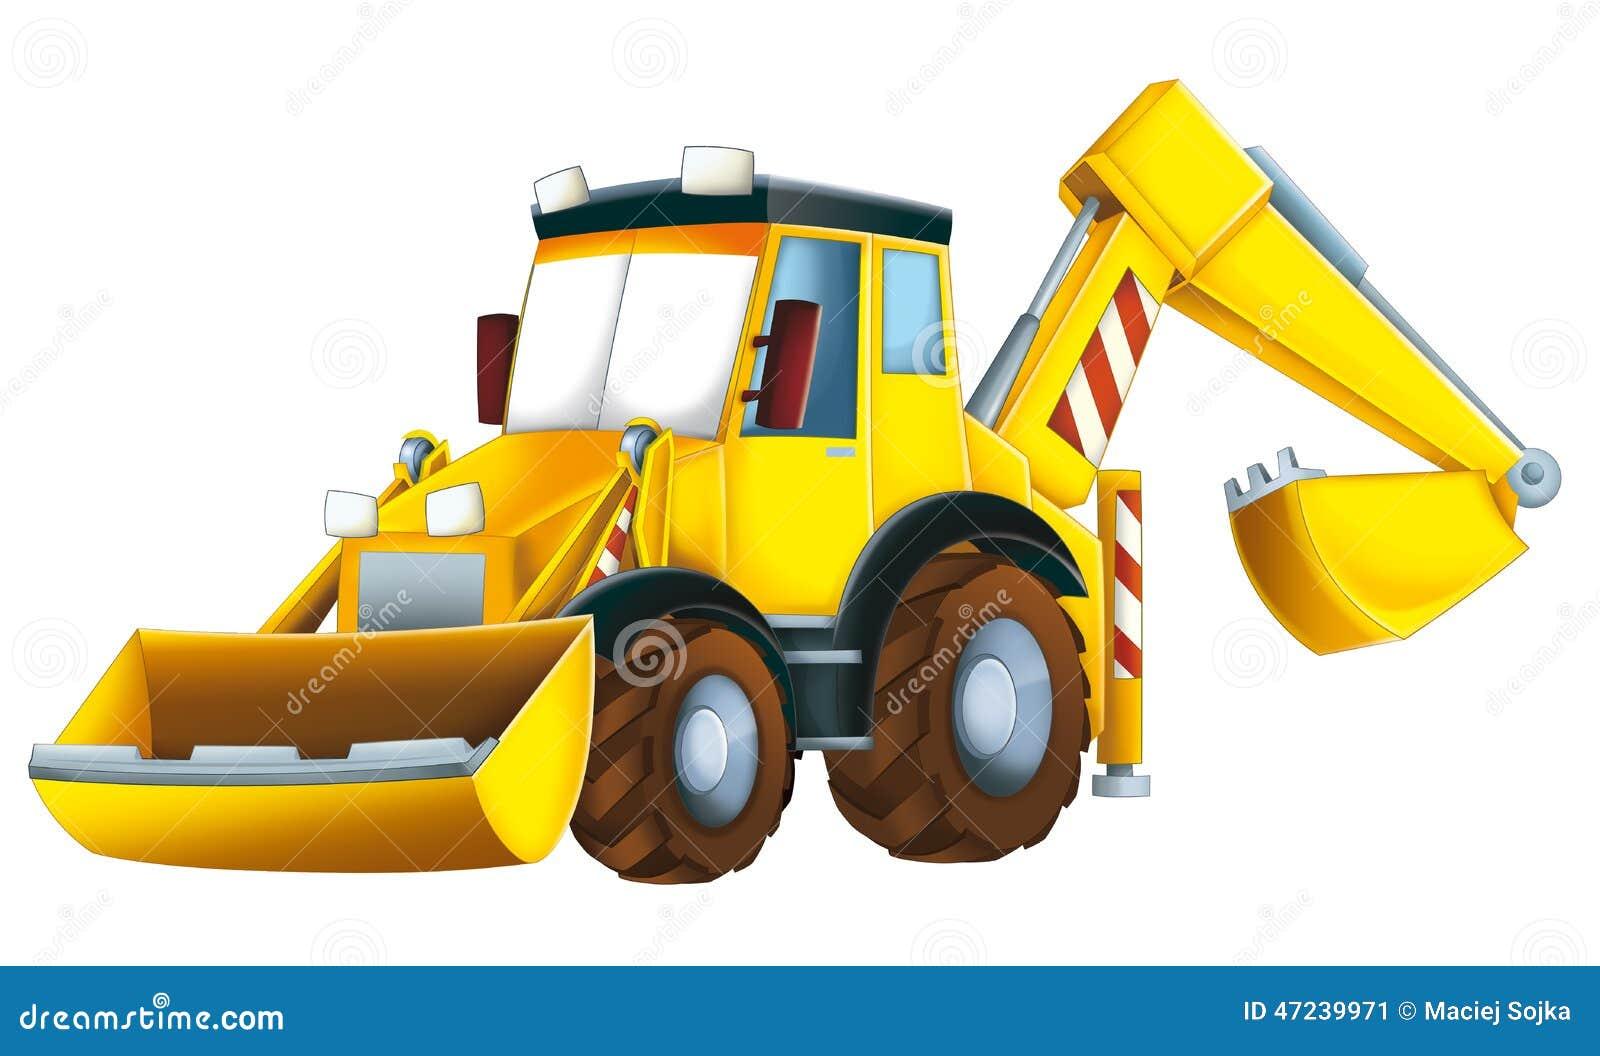 cartoon excavator stock illustration image 47239971 bulldozer clipart free outline bulldozer clip art black & white